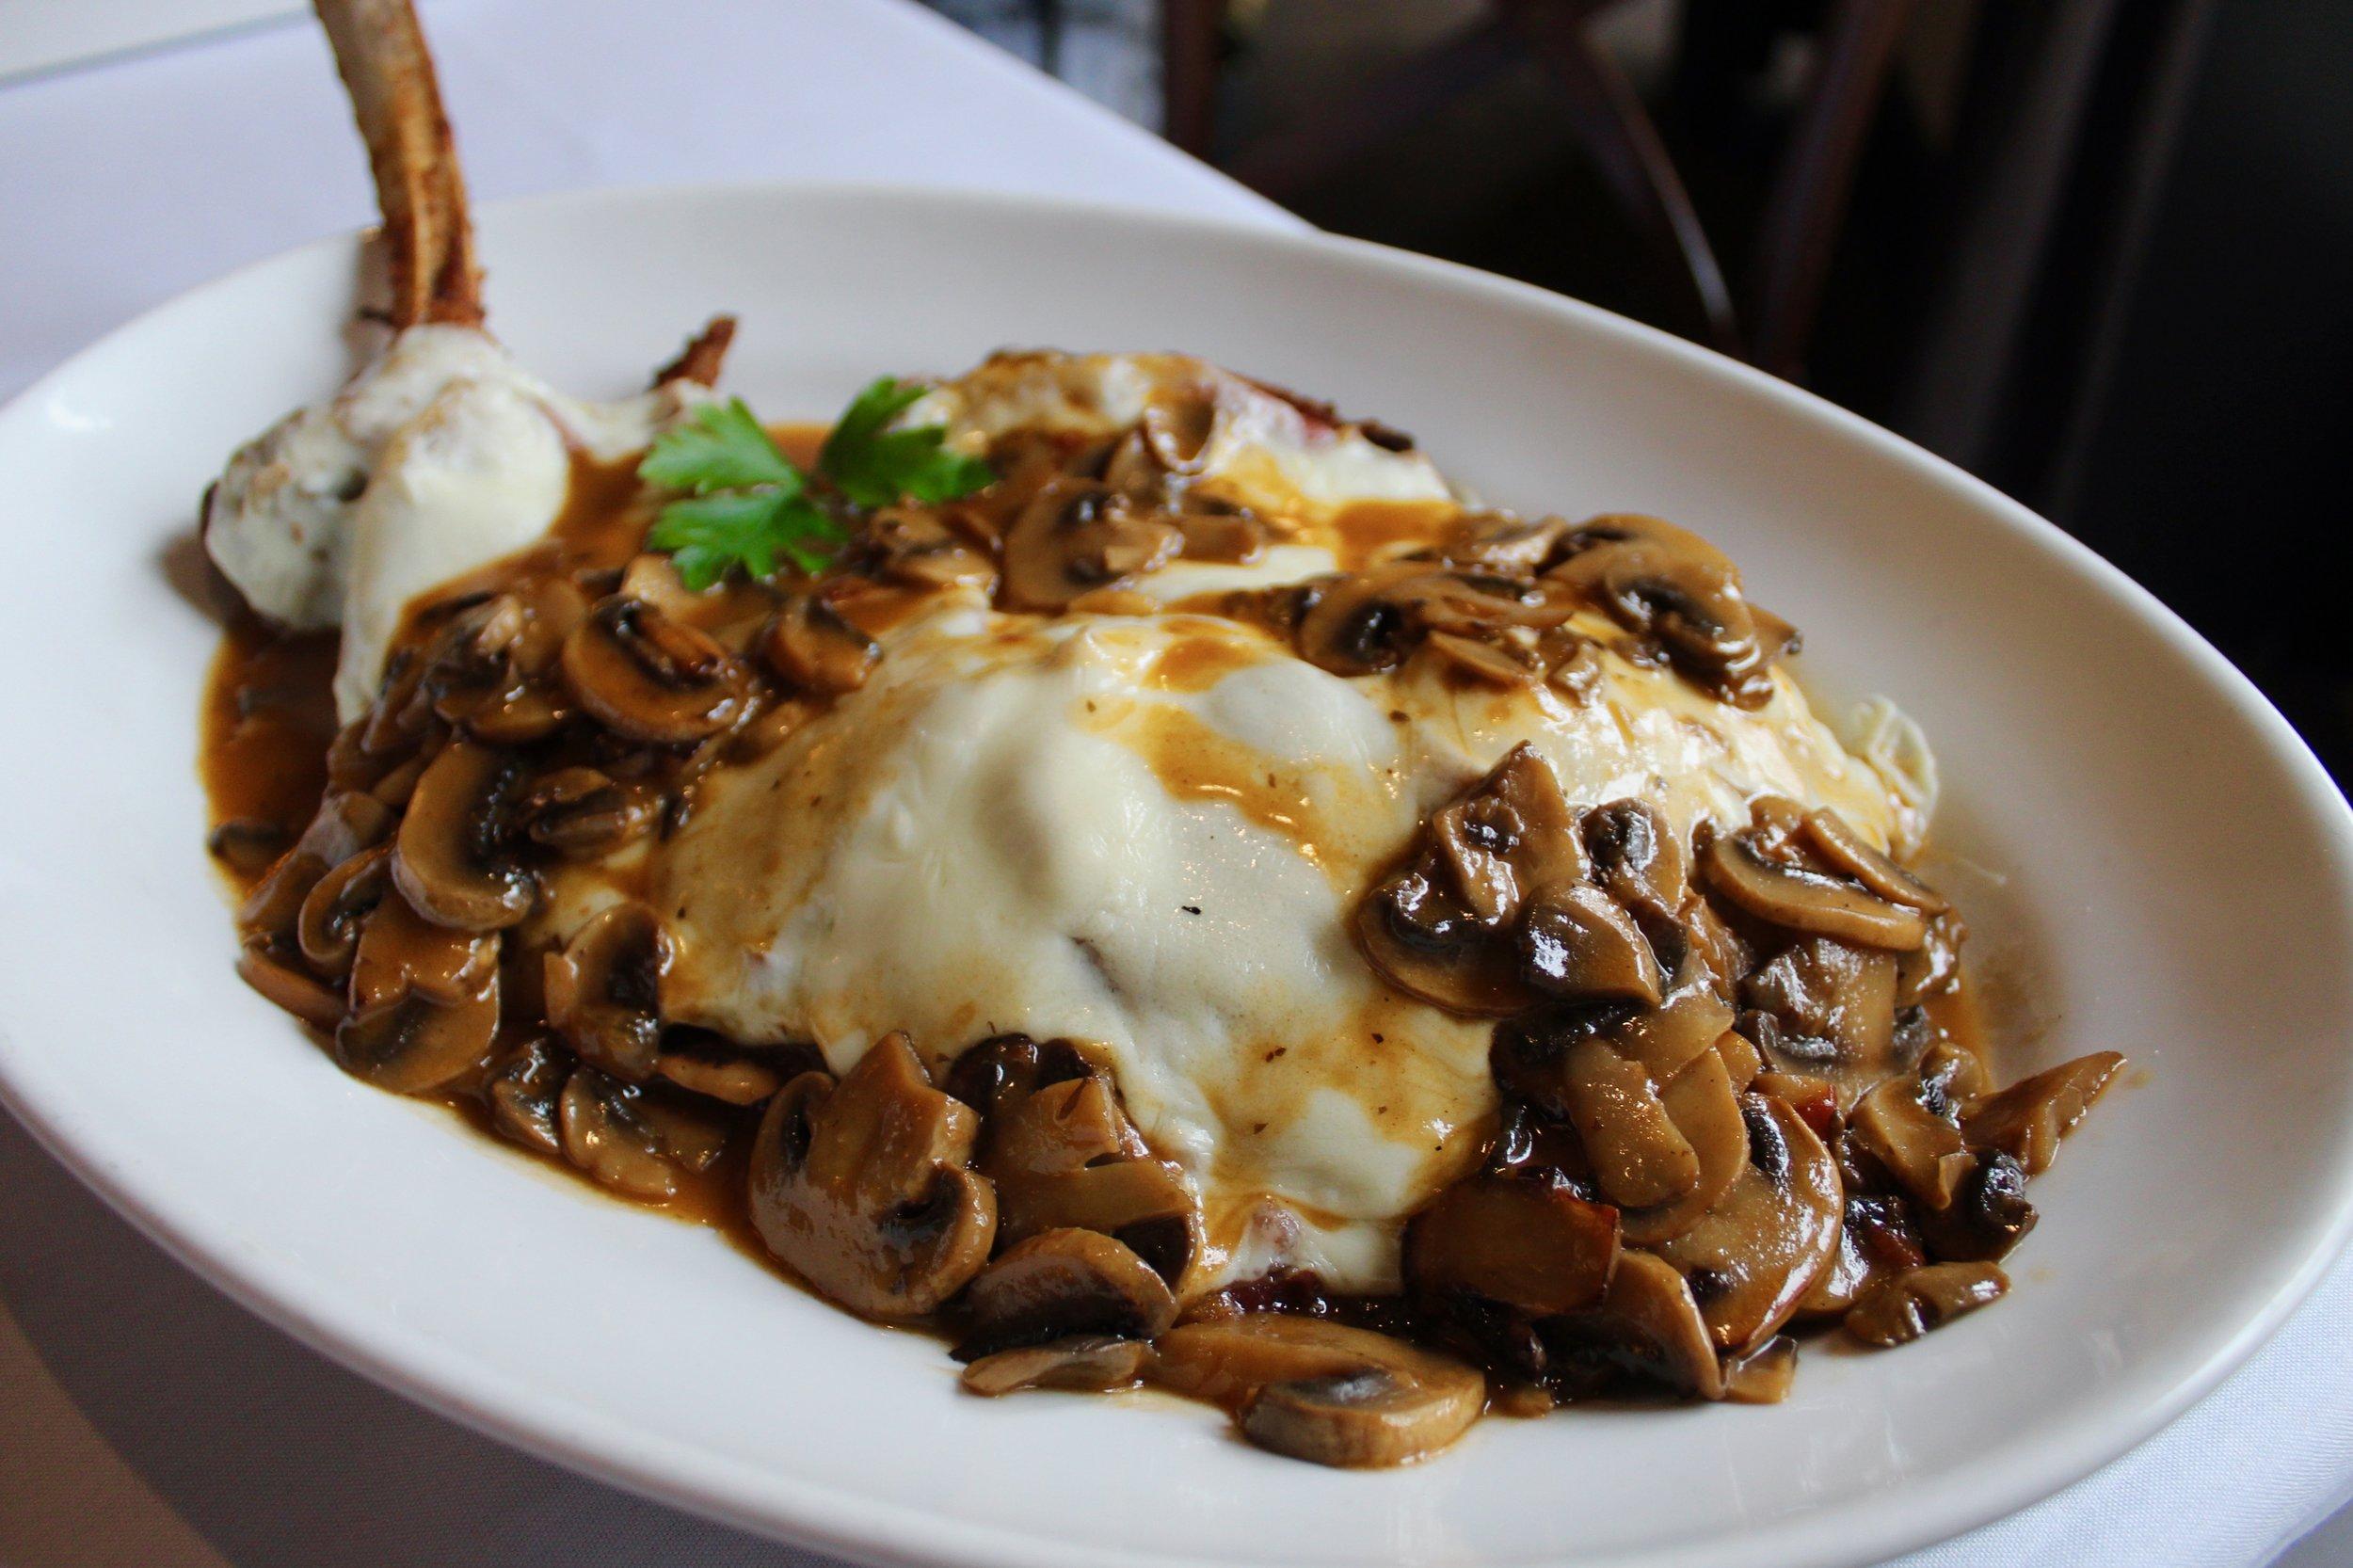 Veal Chop Valdostana with mozzarella, prosciutto, mushroom, marsala.